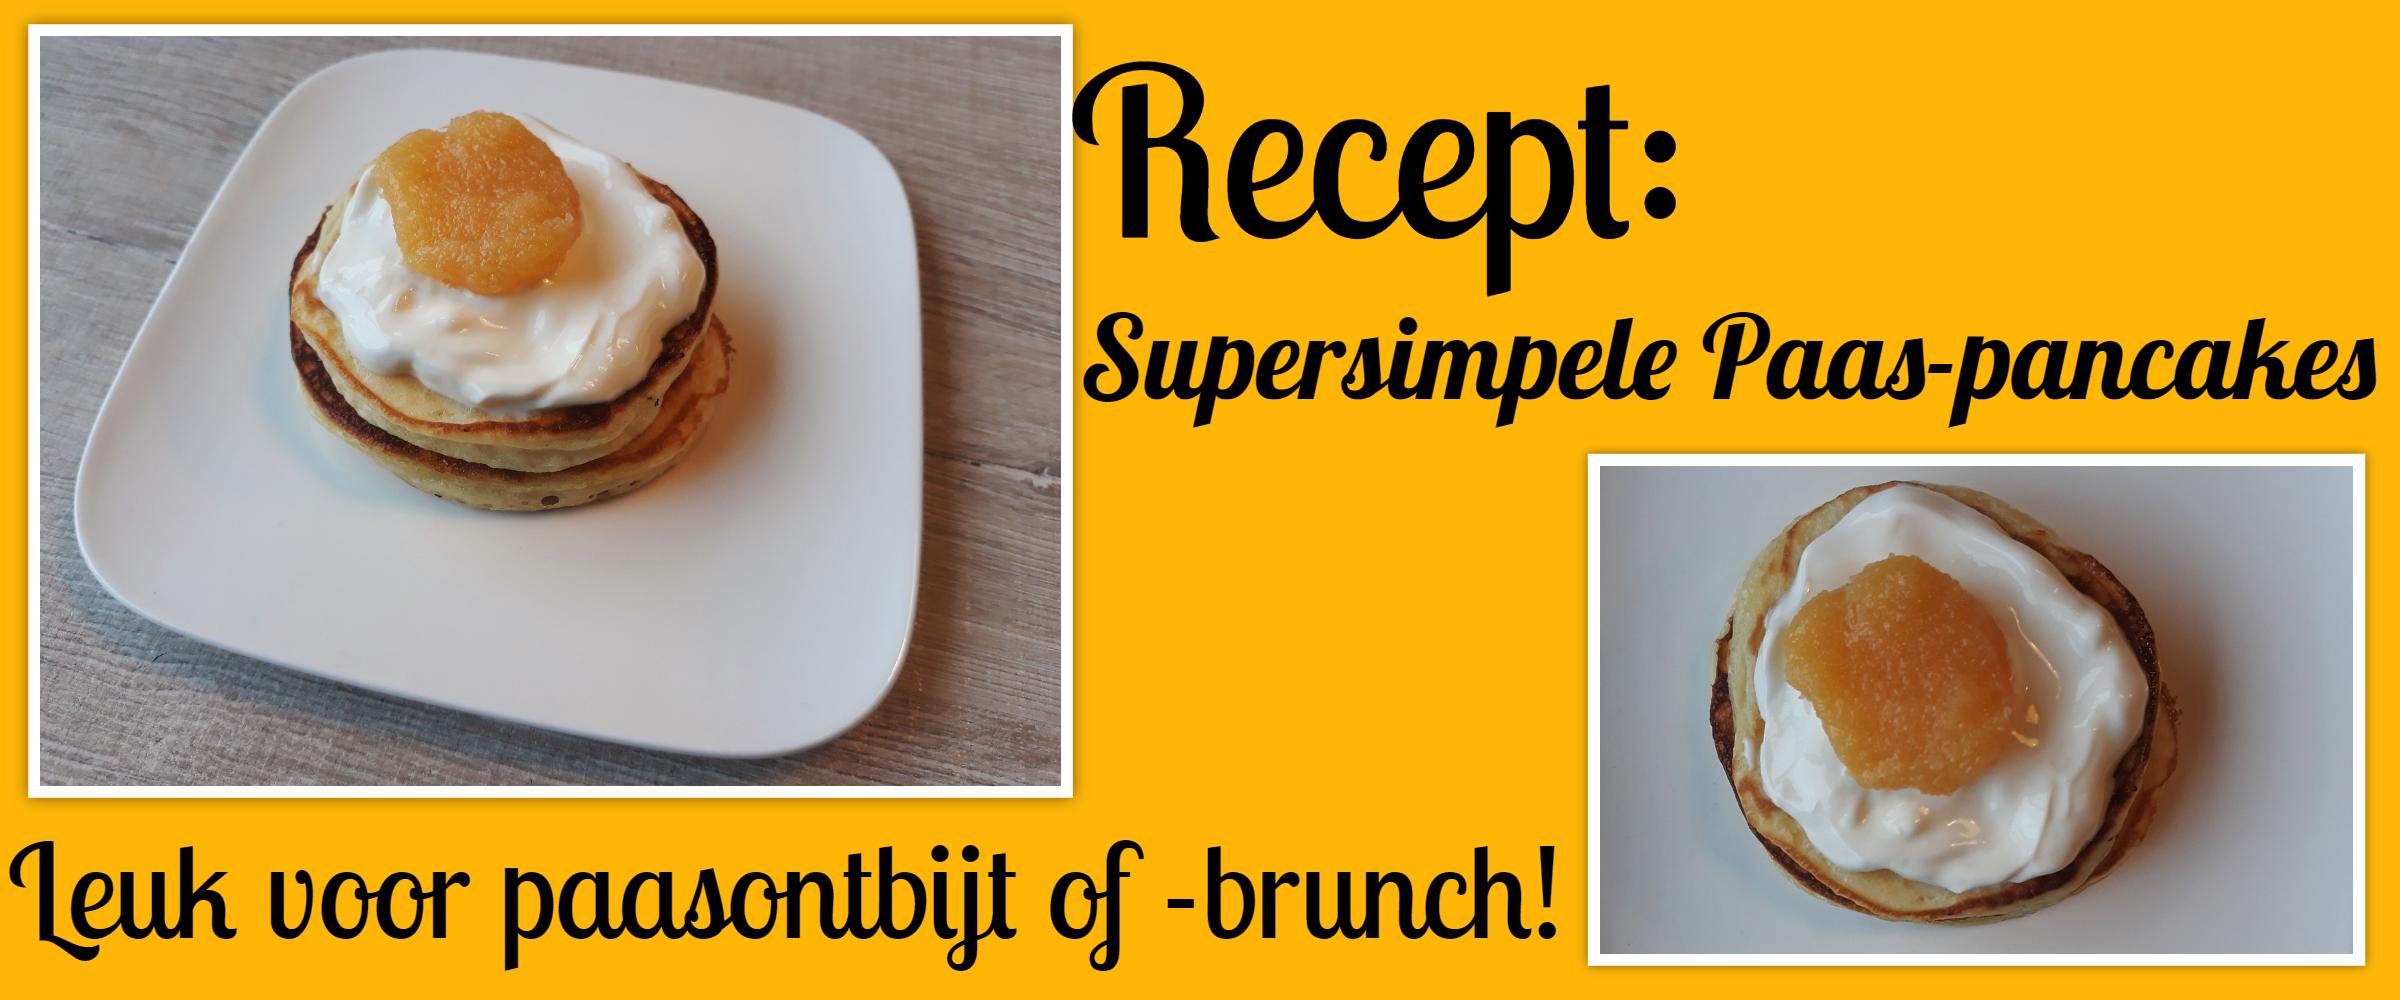 Collage recept supersimpele Paas-pancakes met nep-spiegeleitje, leuk voor paasontbijt of paasbrunch